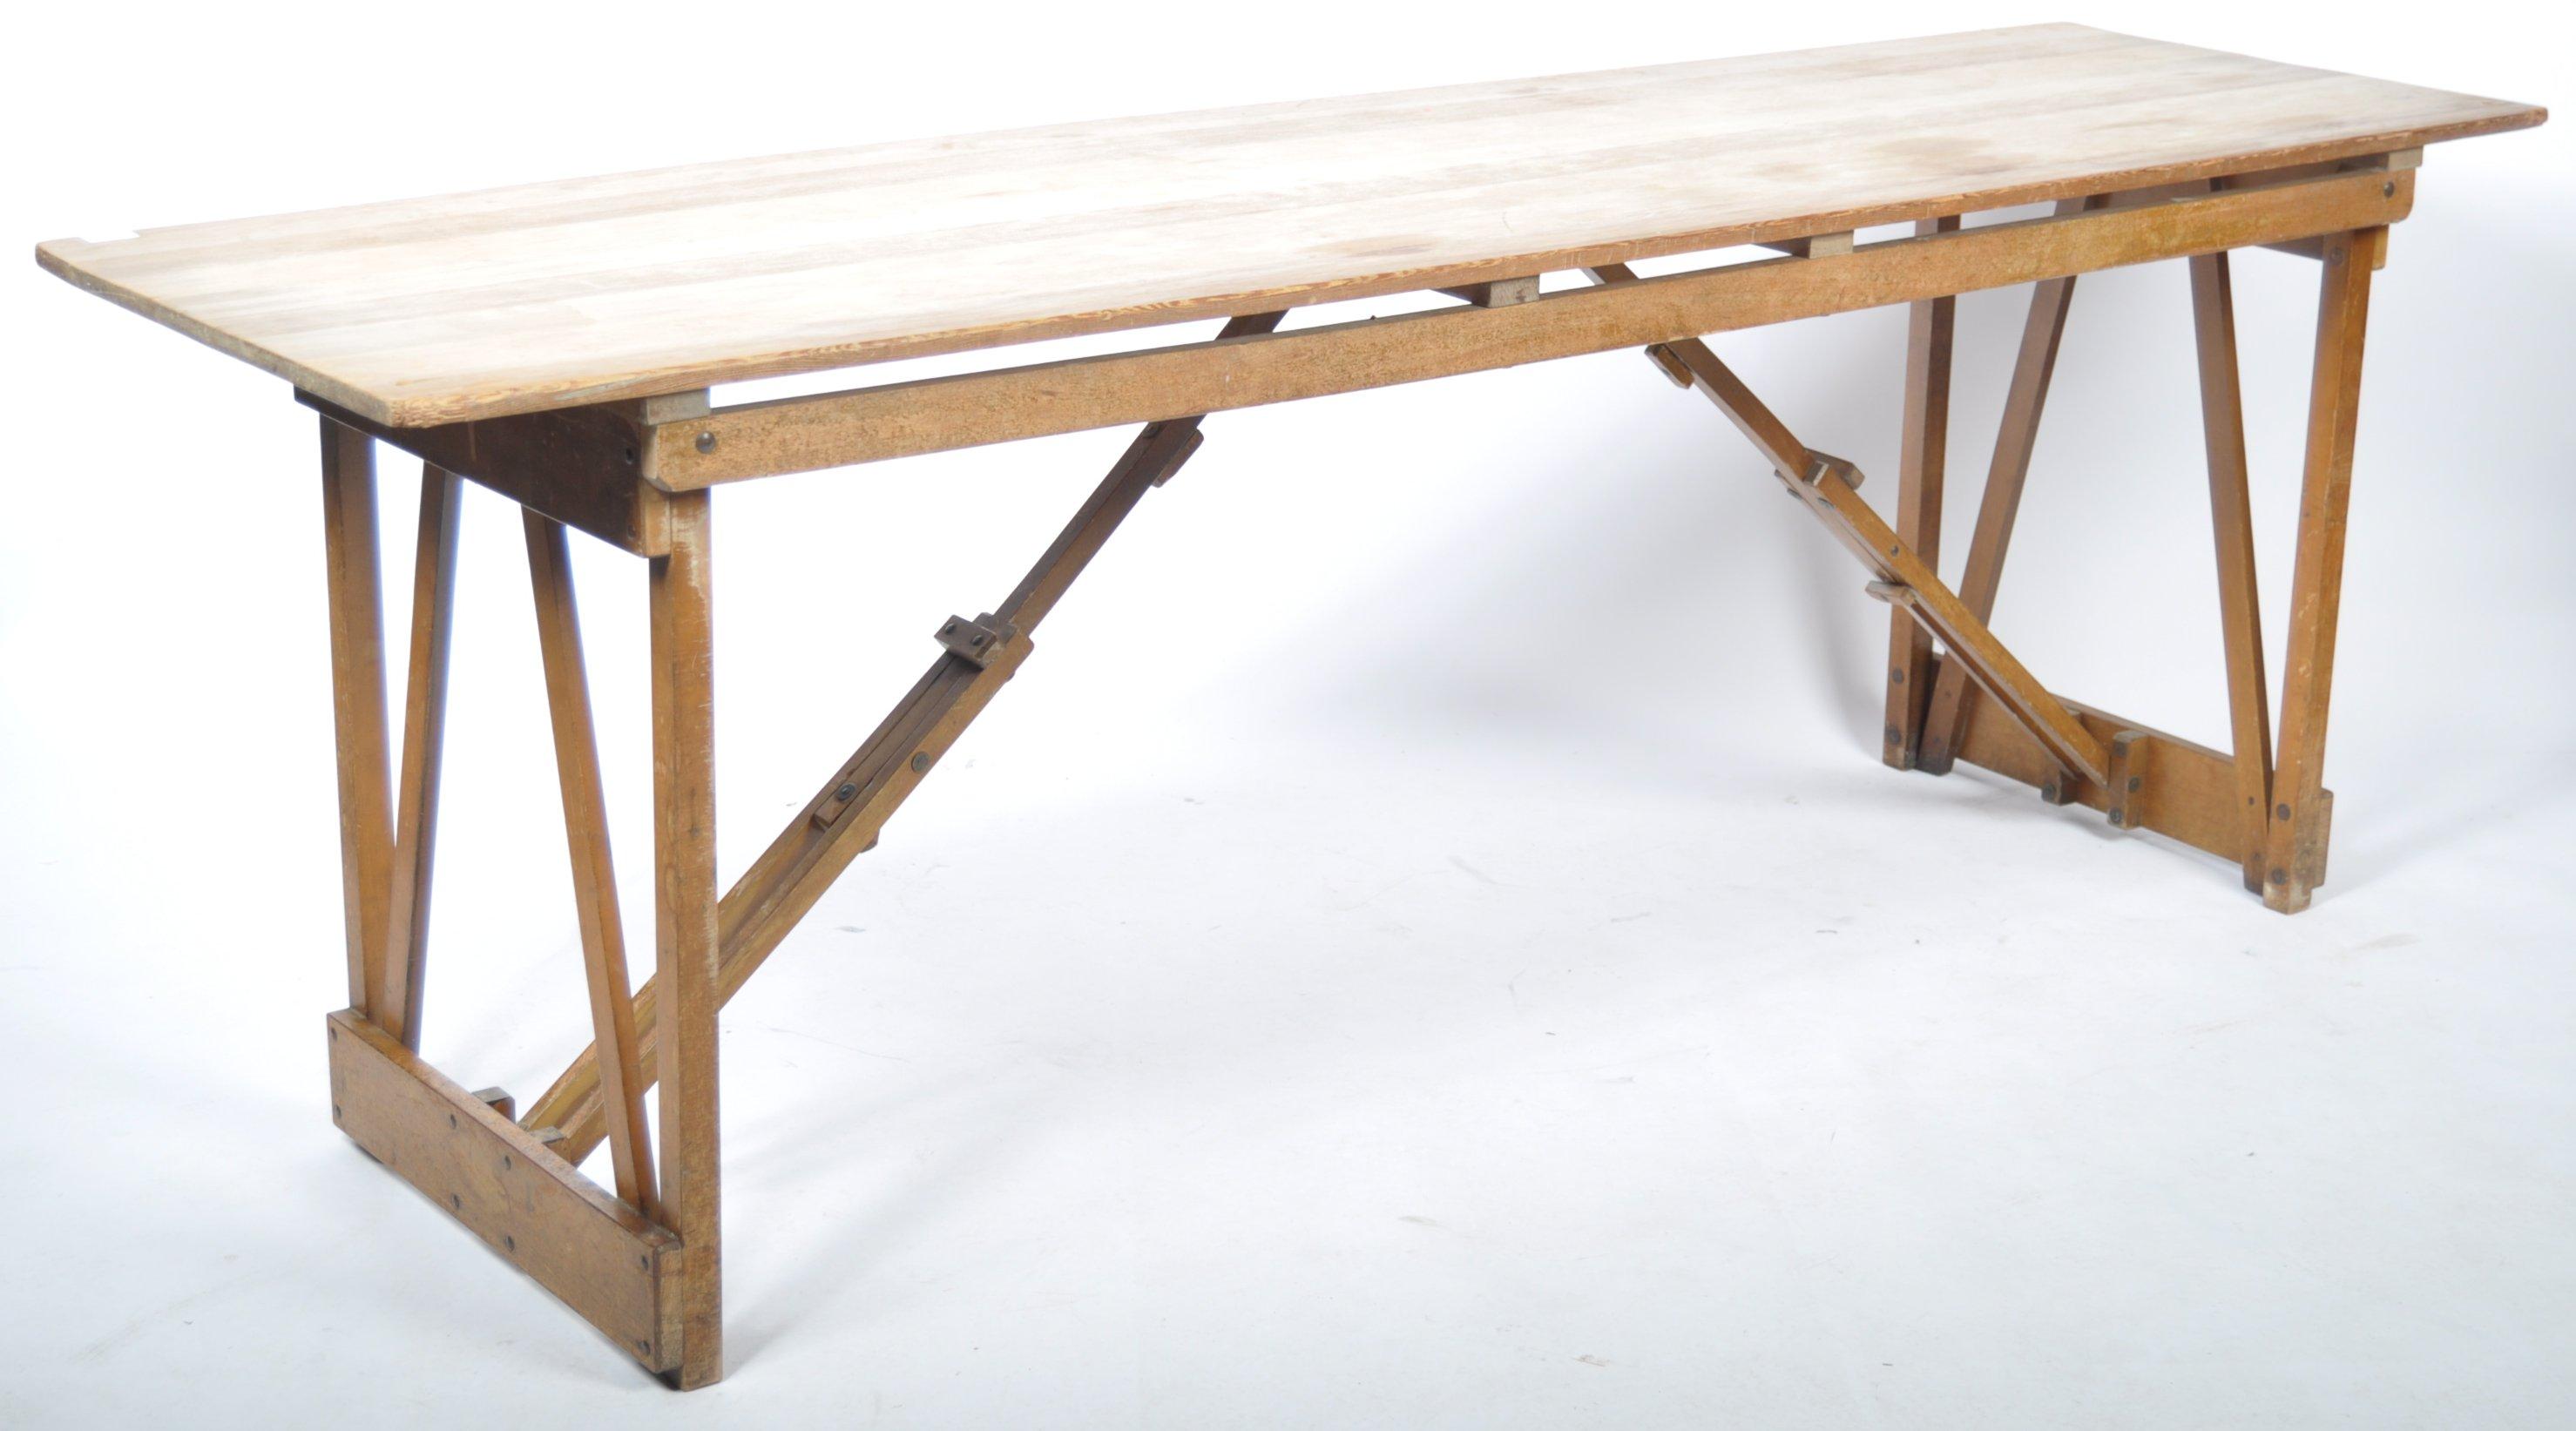 Lot 58 - MID CENTURY VINTAGE INDUSTRIAL FOLDING WOODEN TRESTLE TABLE